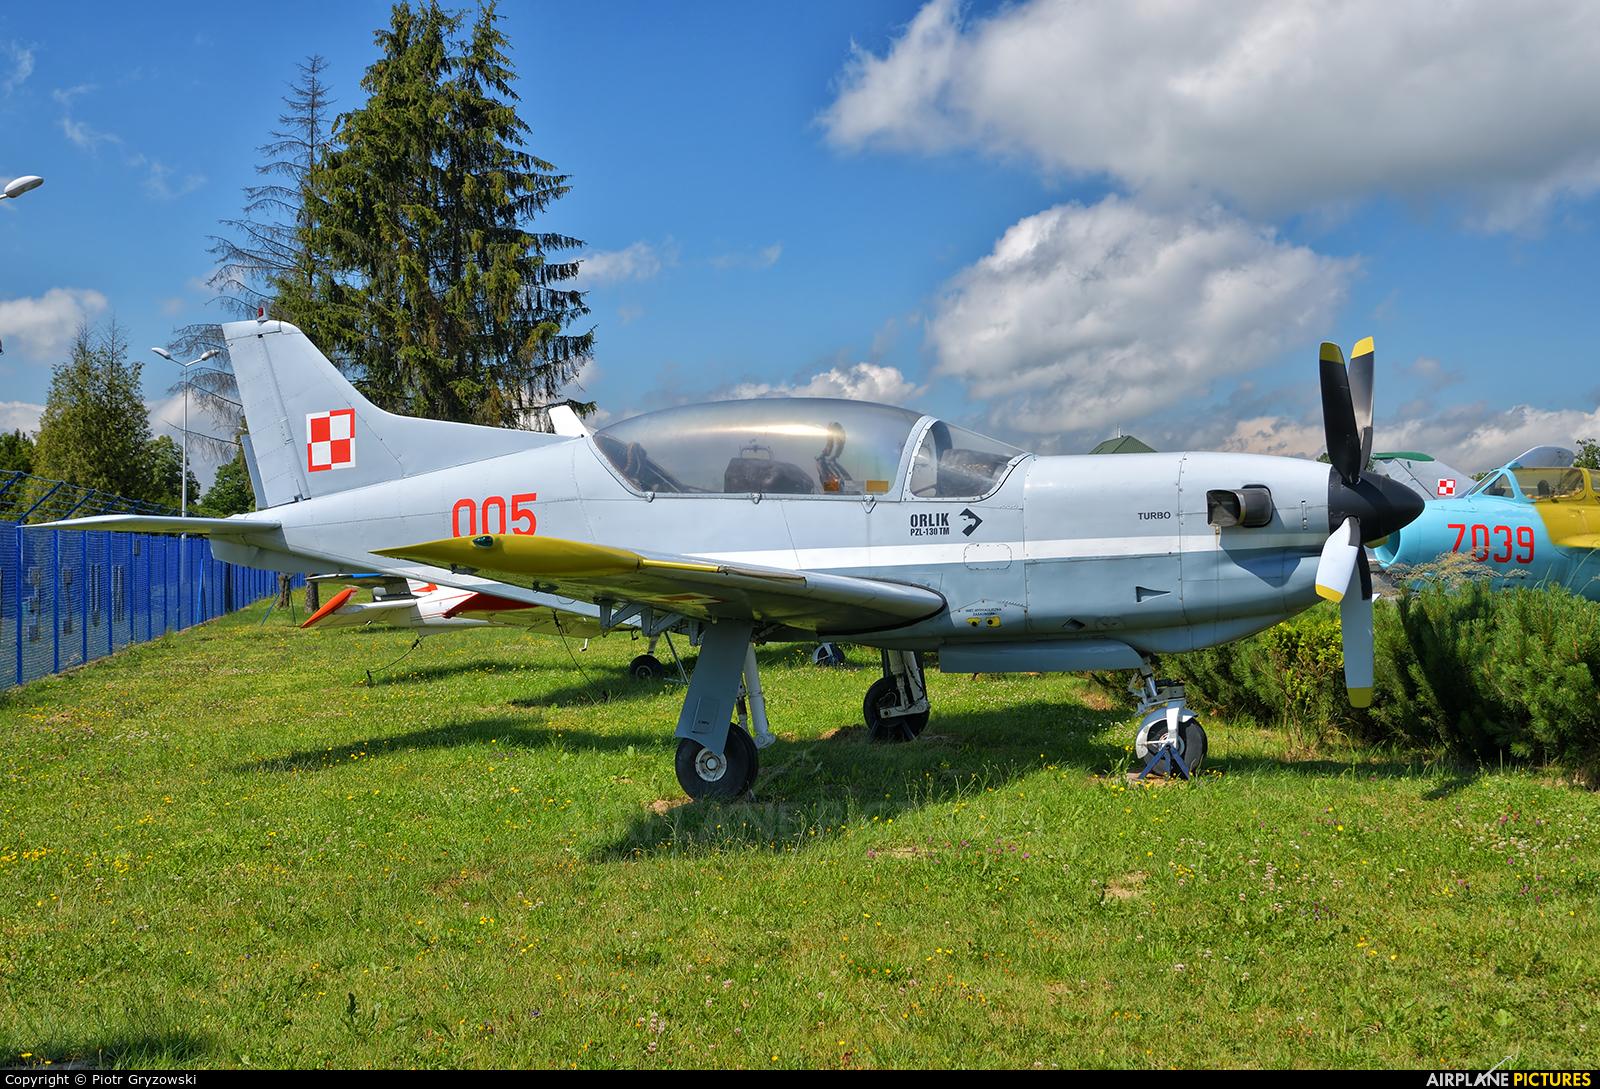 Poland - Air Force 005 aircraft at Dęblin - Museum of Polish Air Force